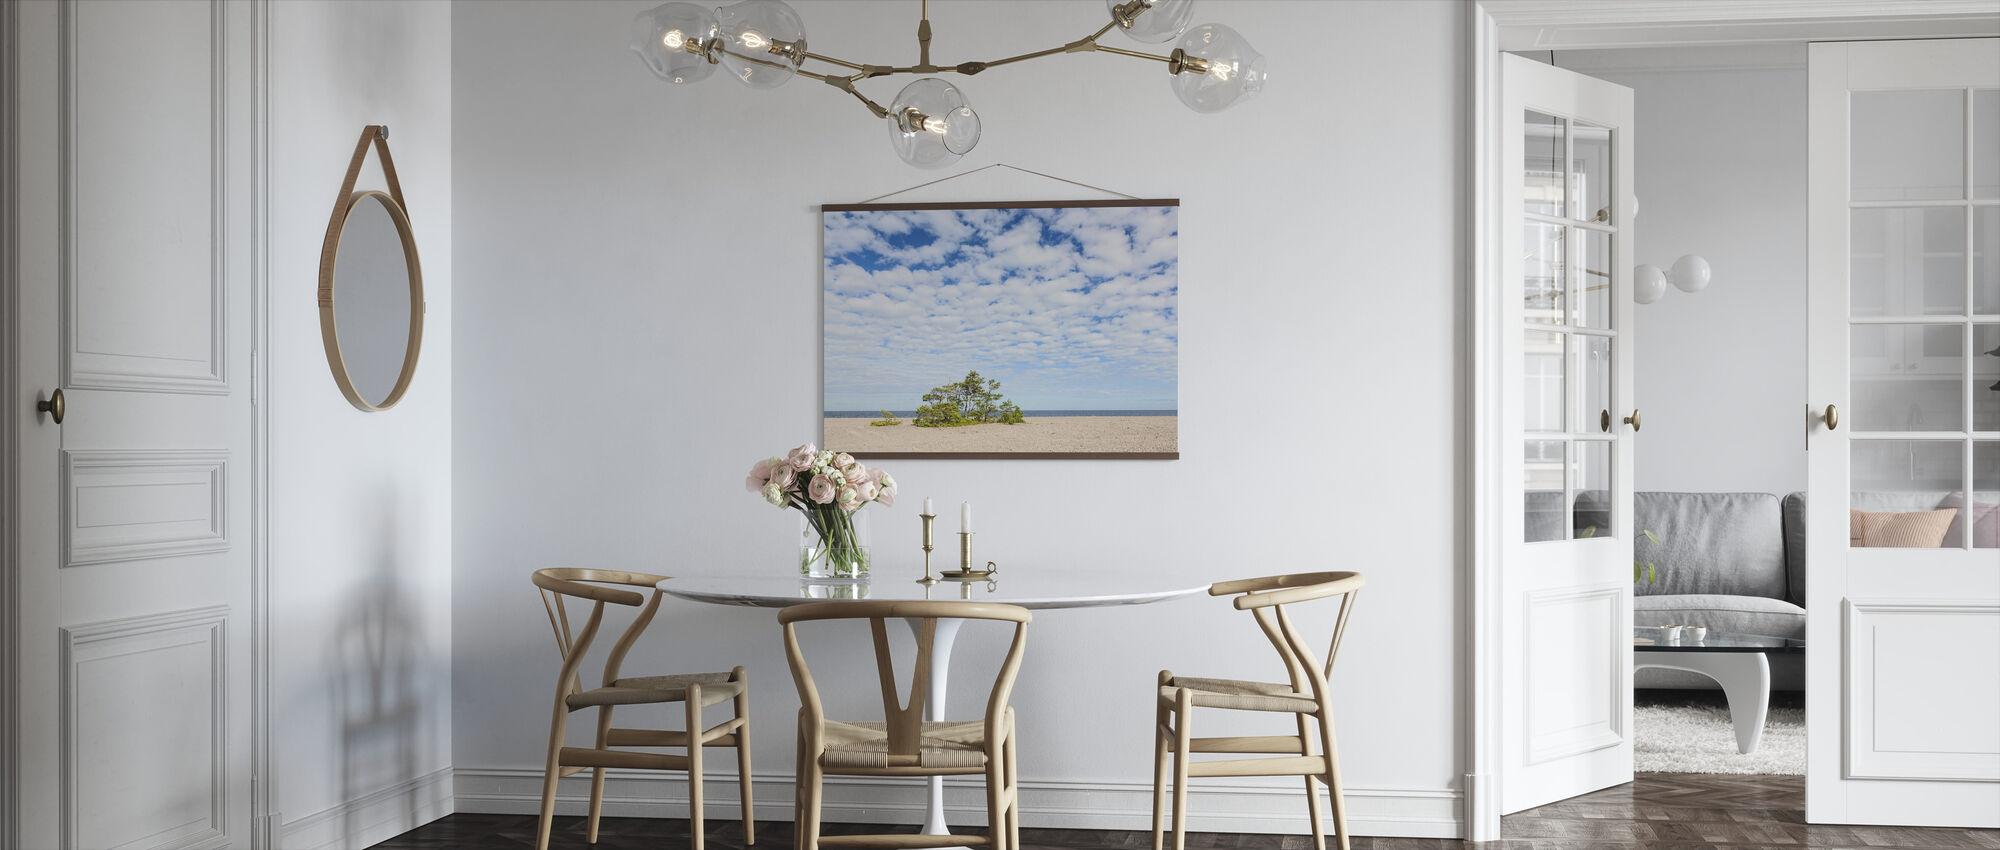 Alto Cumulus - Poster - Kitchen